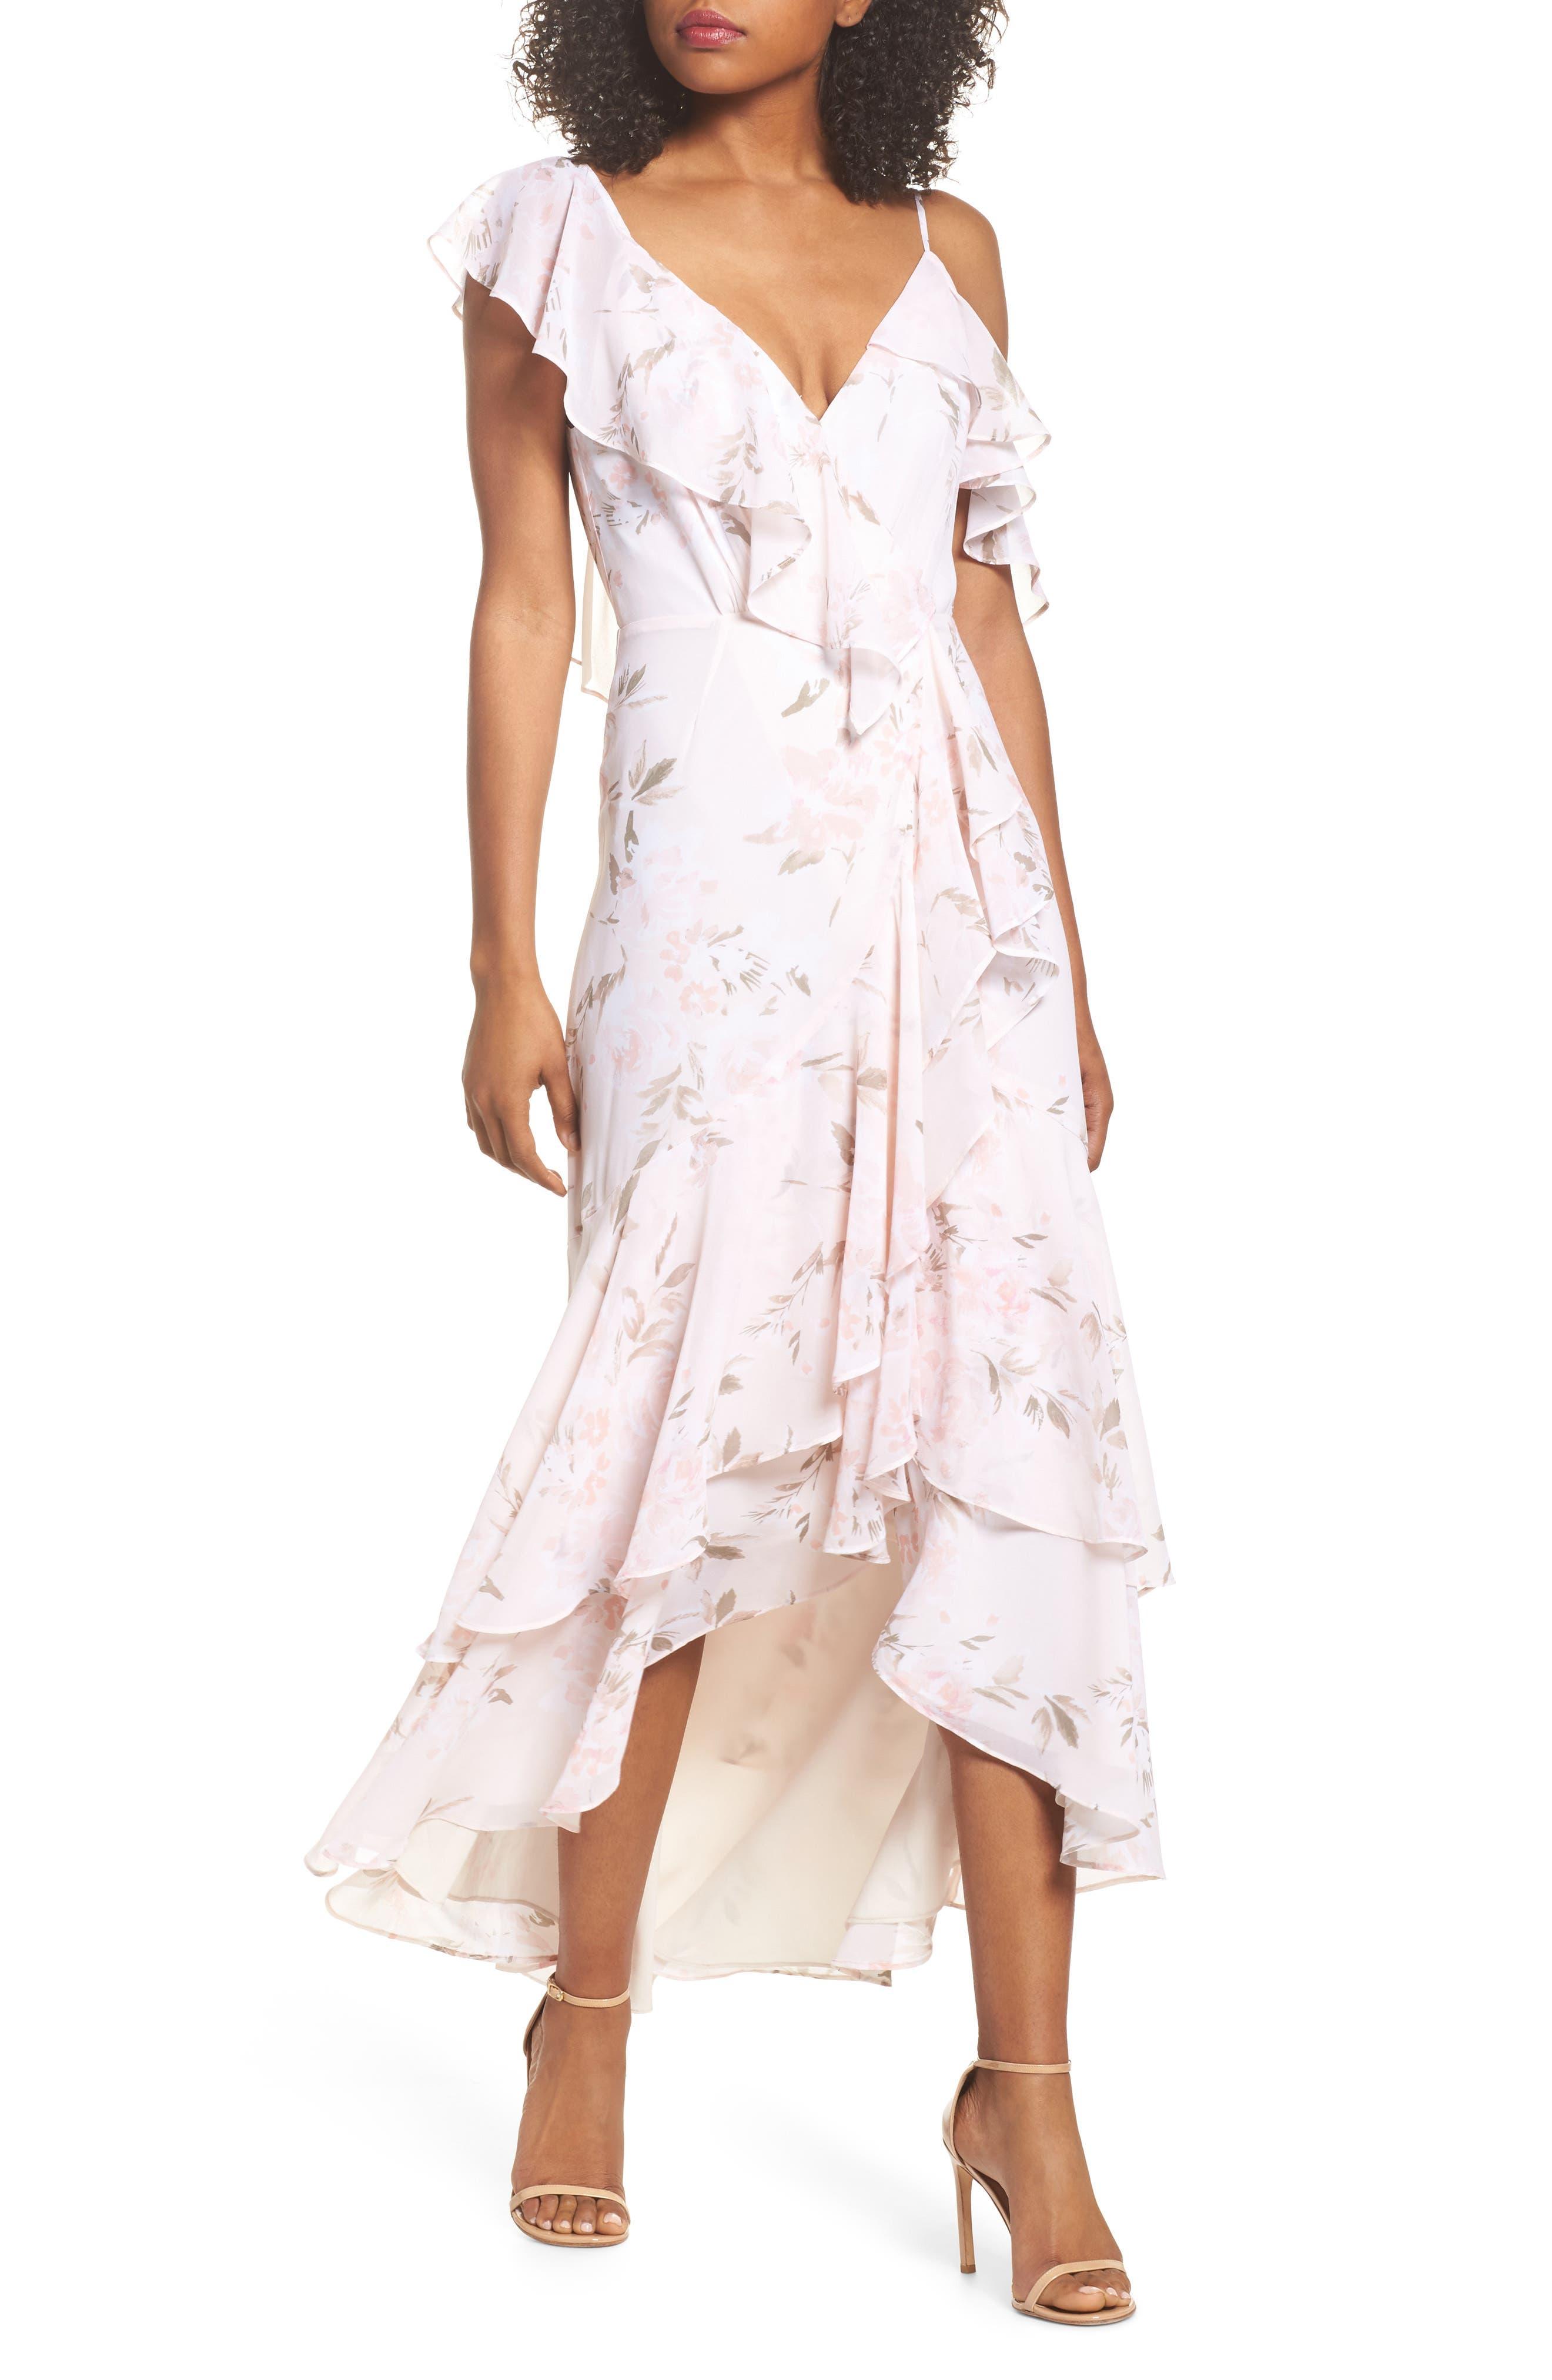 Mismatch Chiffon Bridesmaid Dresses In Neutral Color